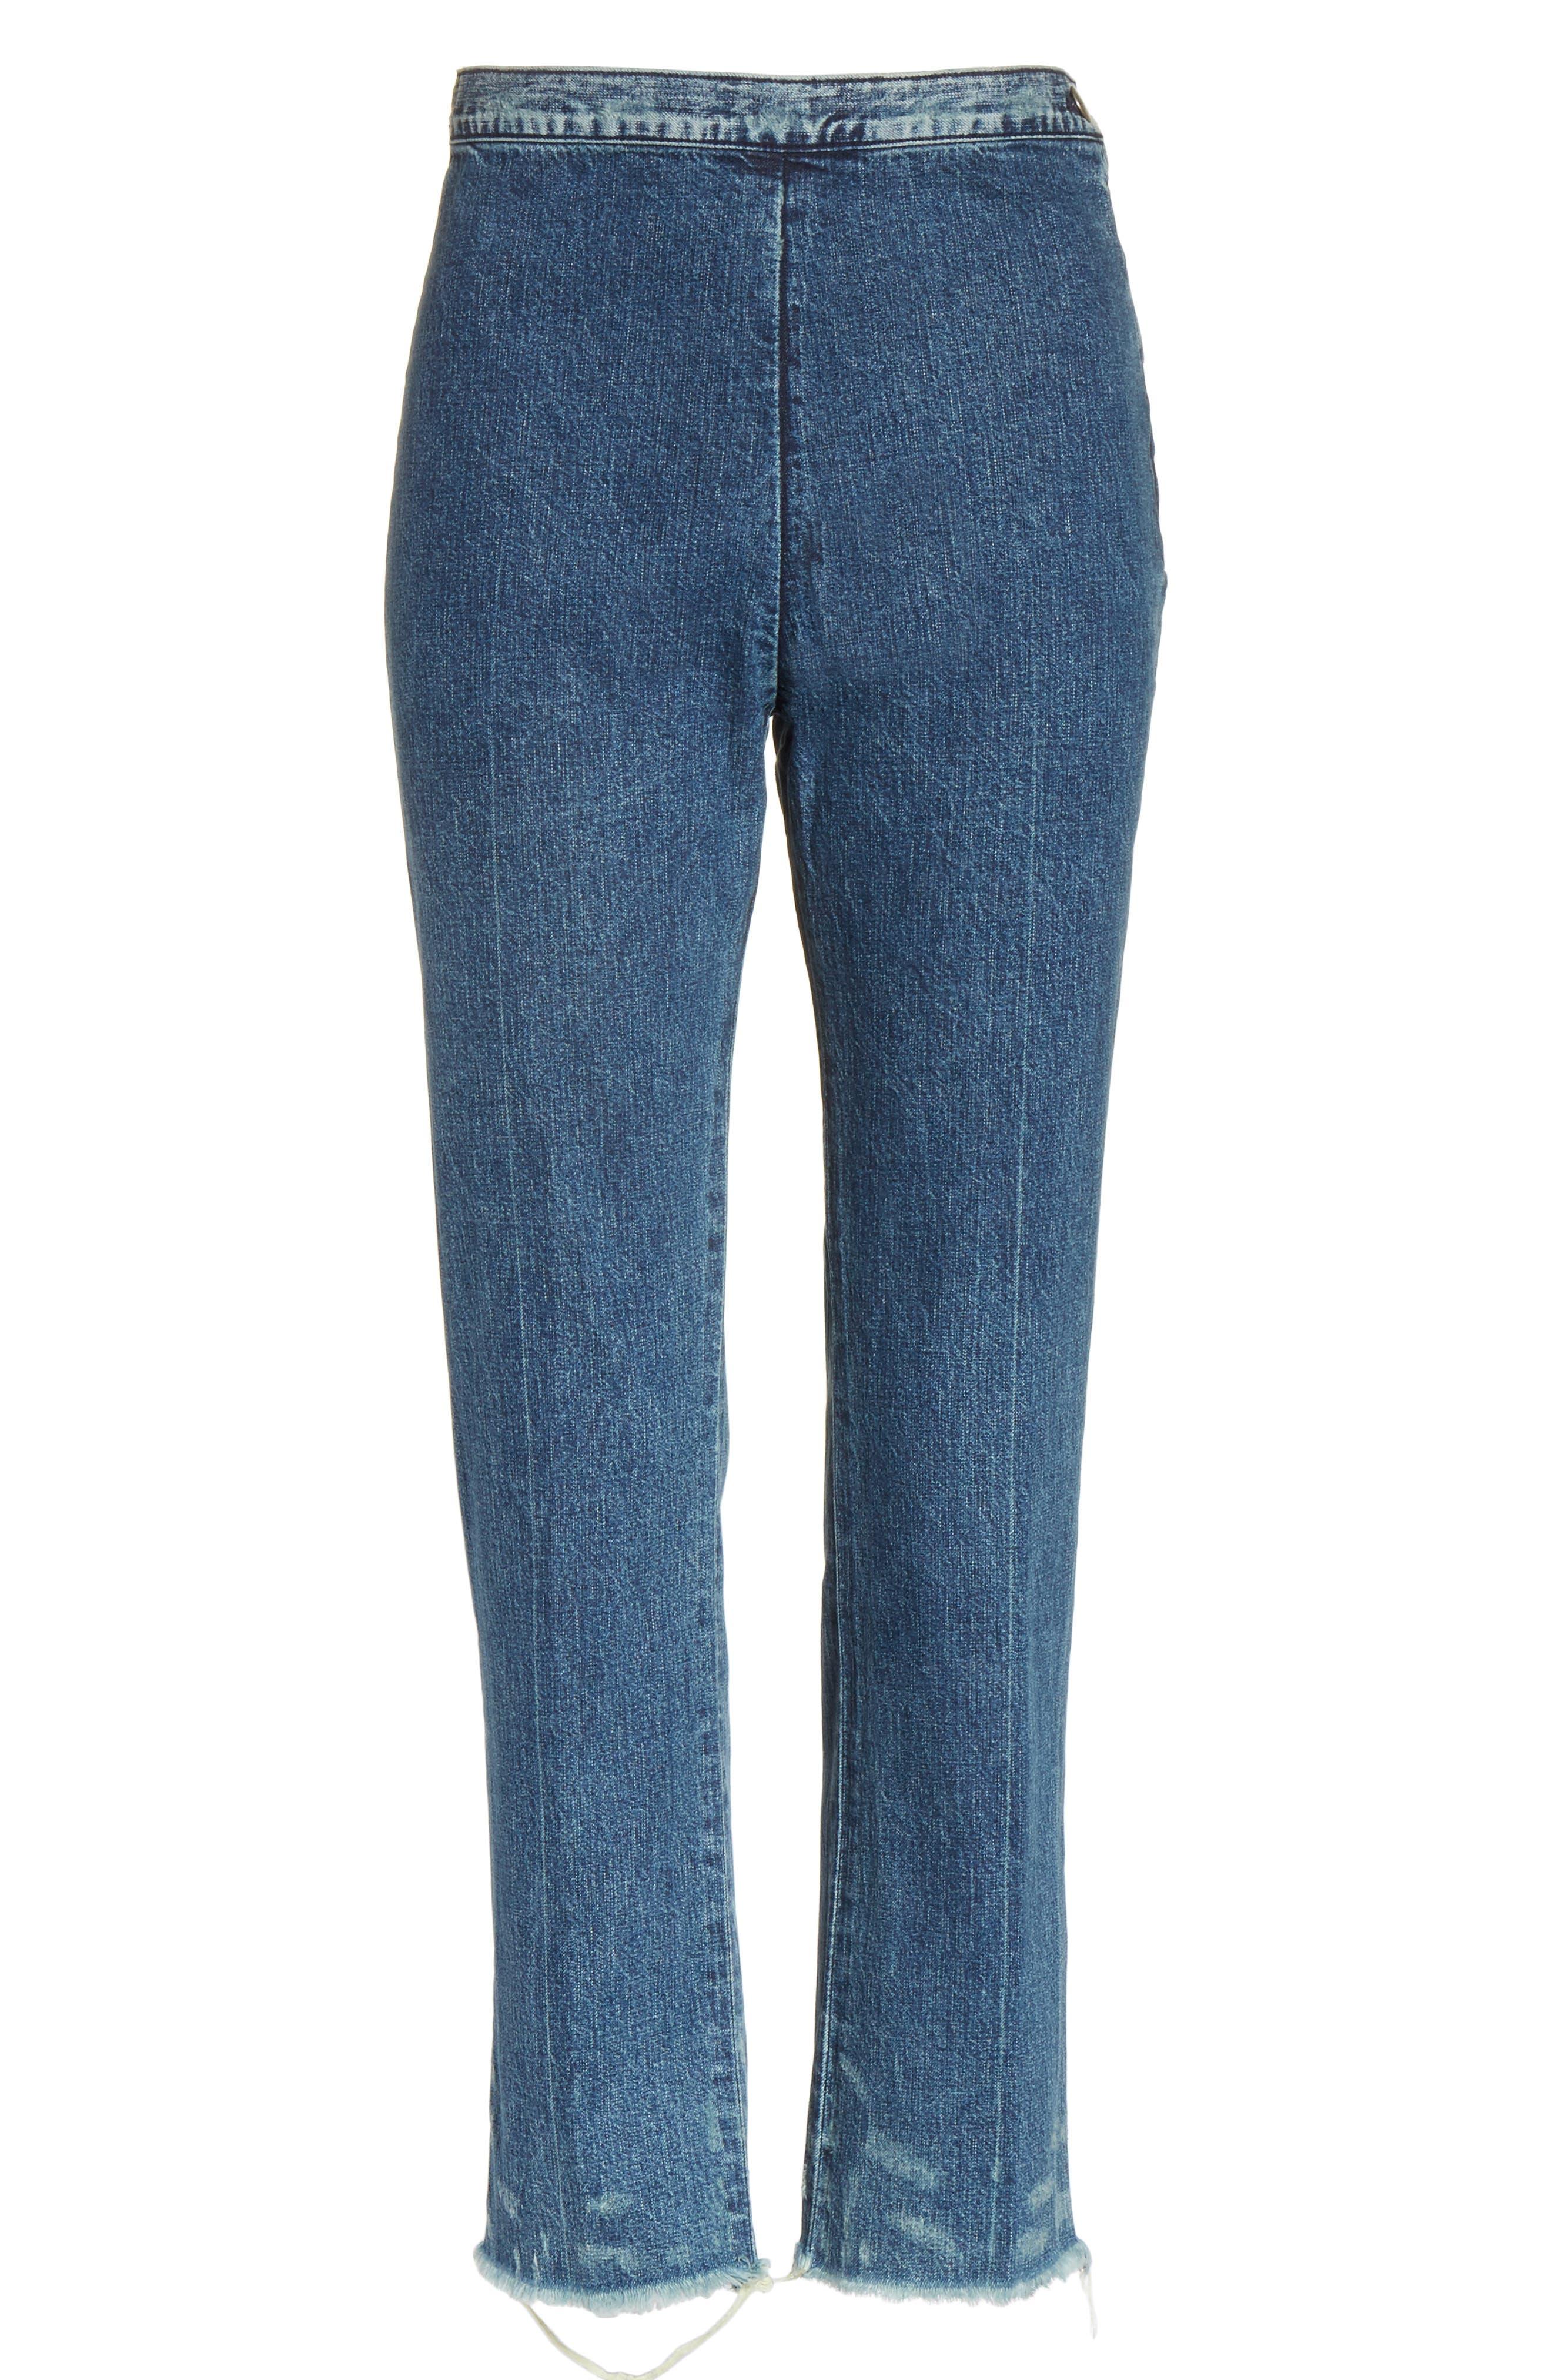 Fletcher Slim Straight Cropped Jeans,                             Alternate thumbnail 6, color,                             Classic Indigo